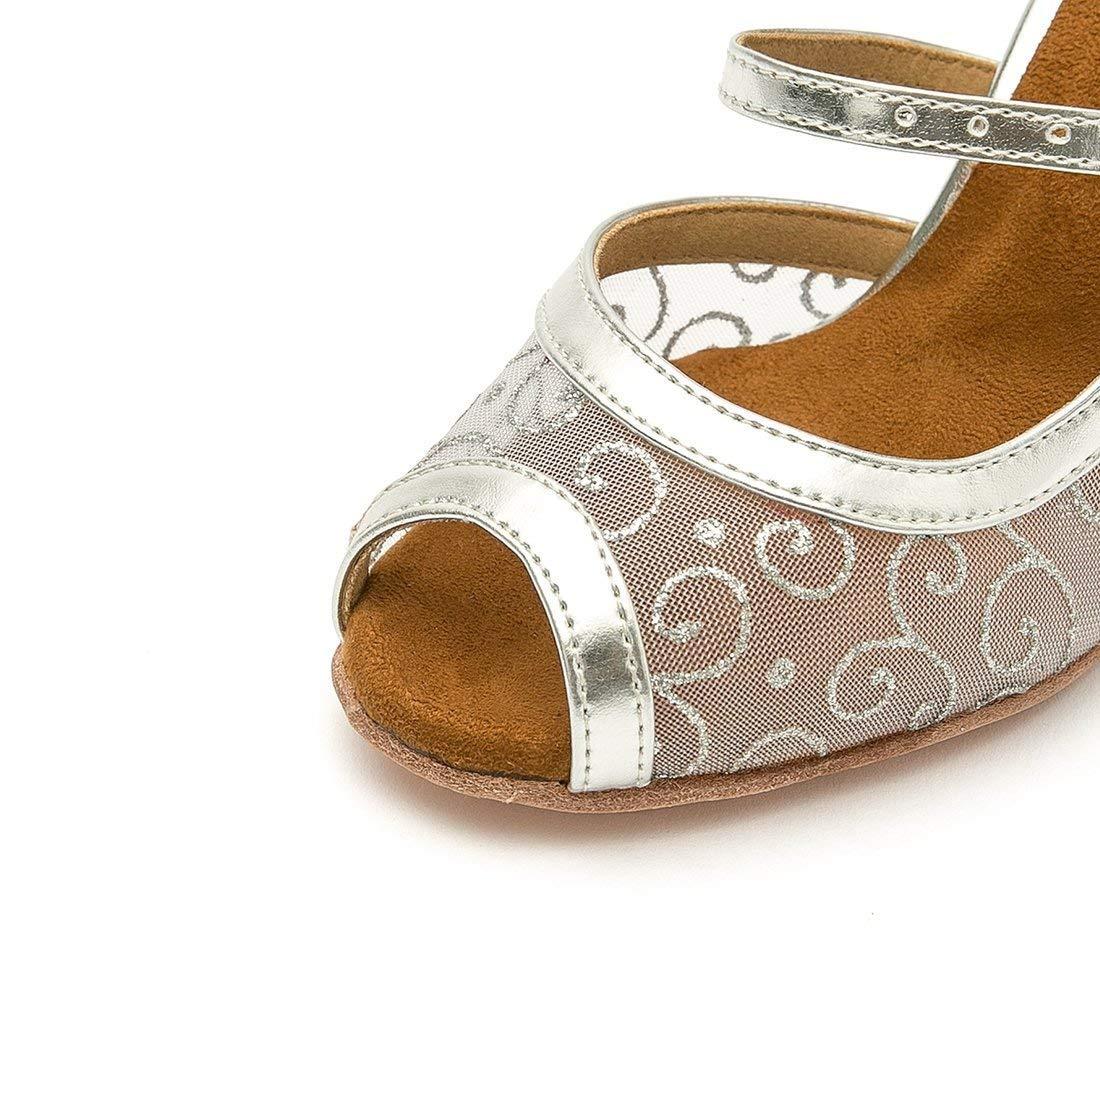 Qiusa Frauen Foral Peep Toe Mesh Latin Tanzschuhe (Farbe Party Sandalen (Farbe Tanzschuhe   Silber-3.35  Heel Größe   3.5 UK) de8538